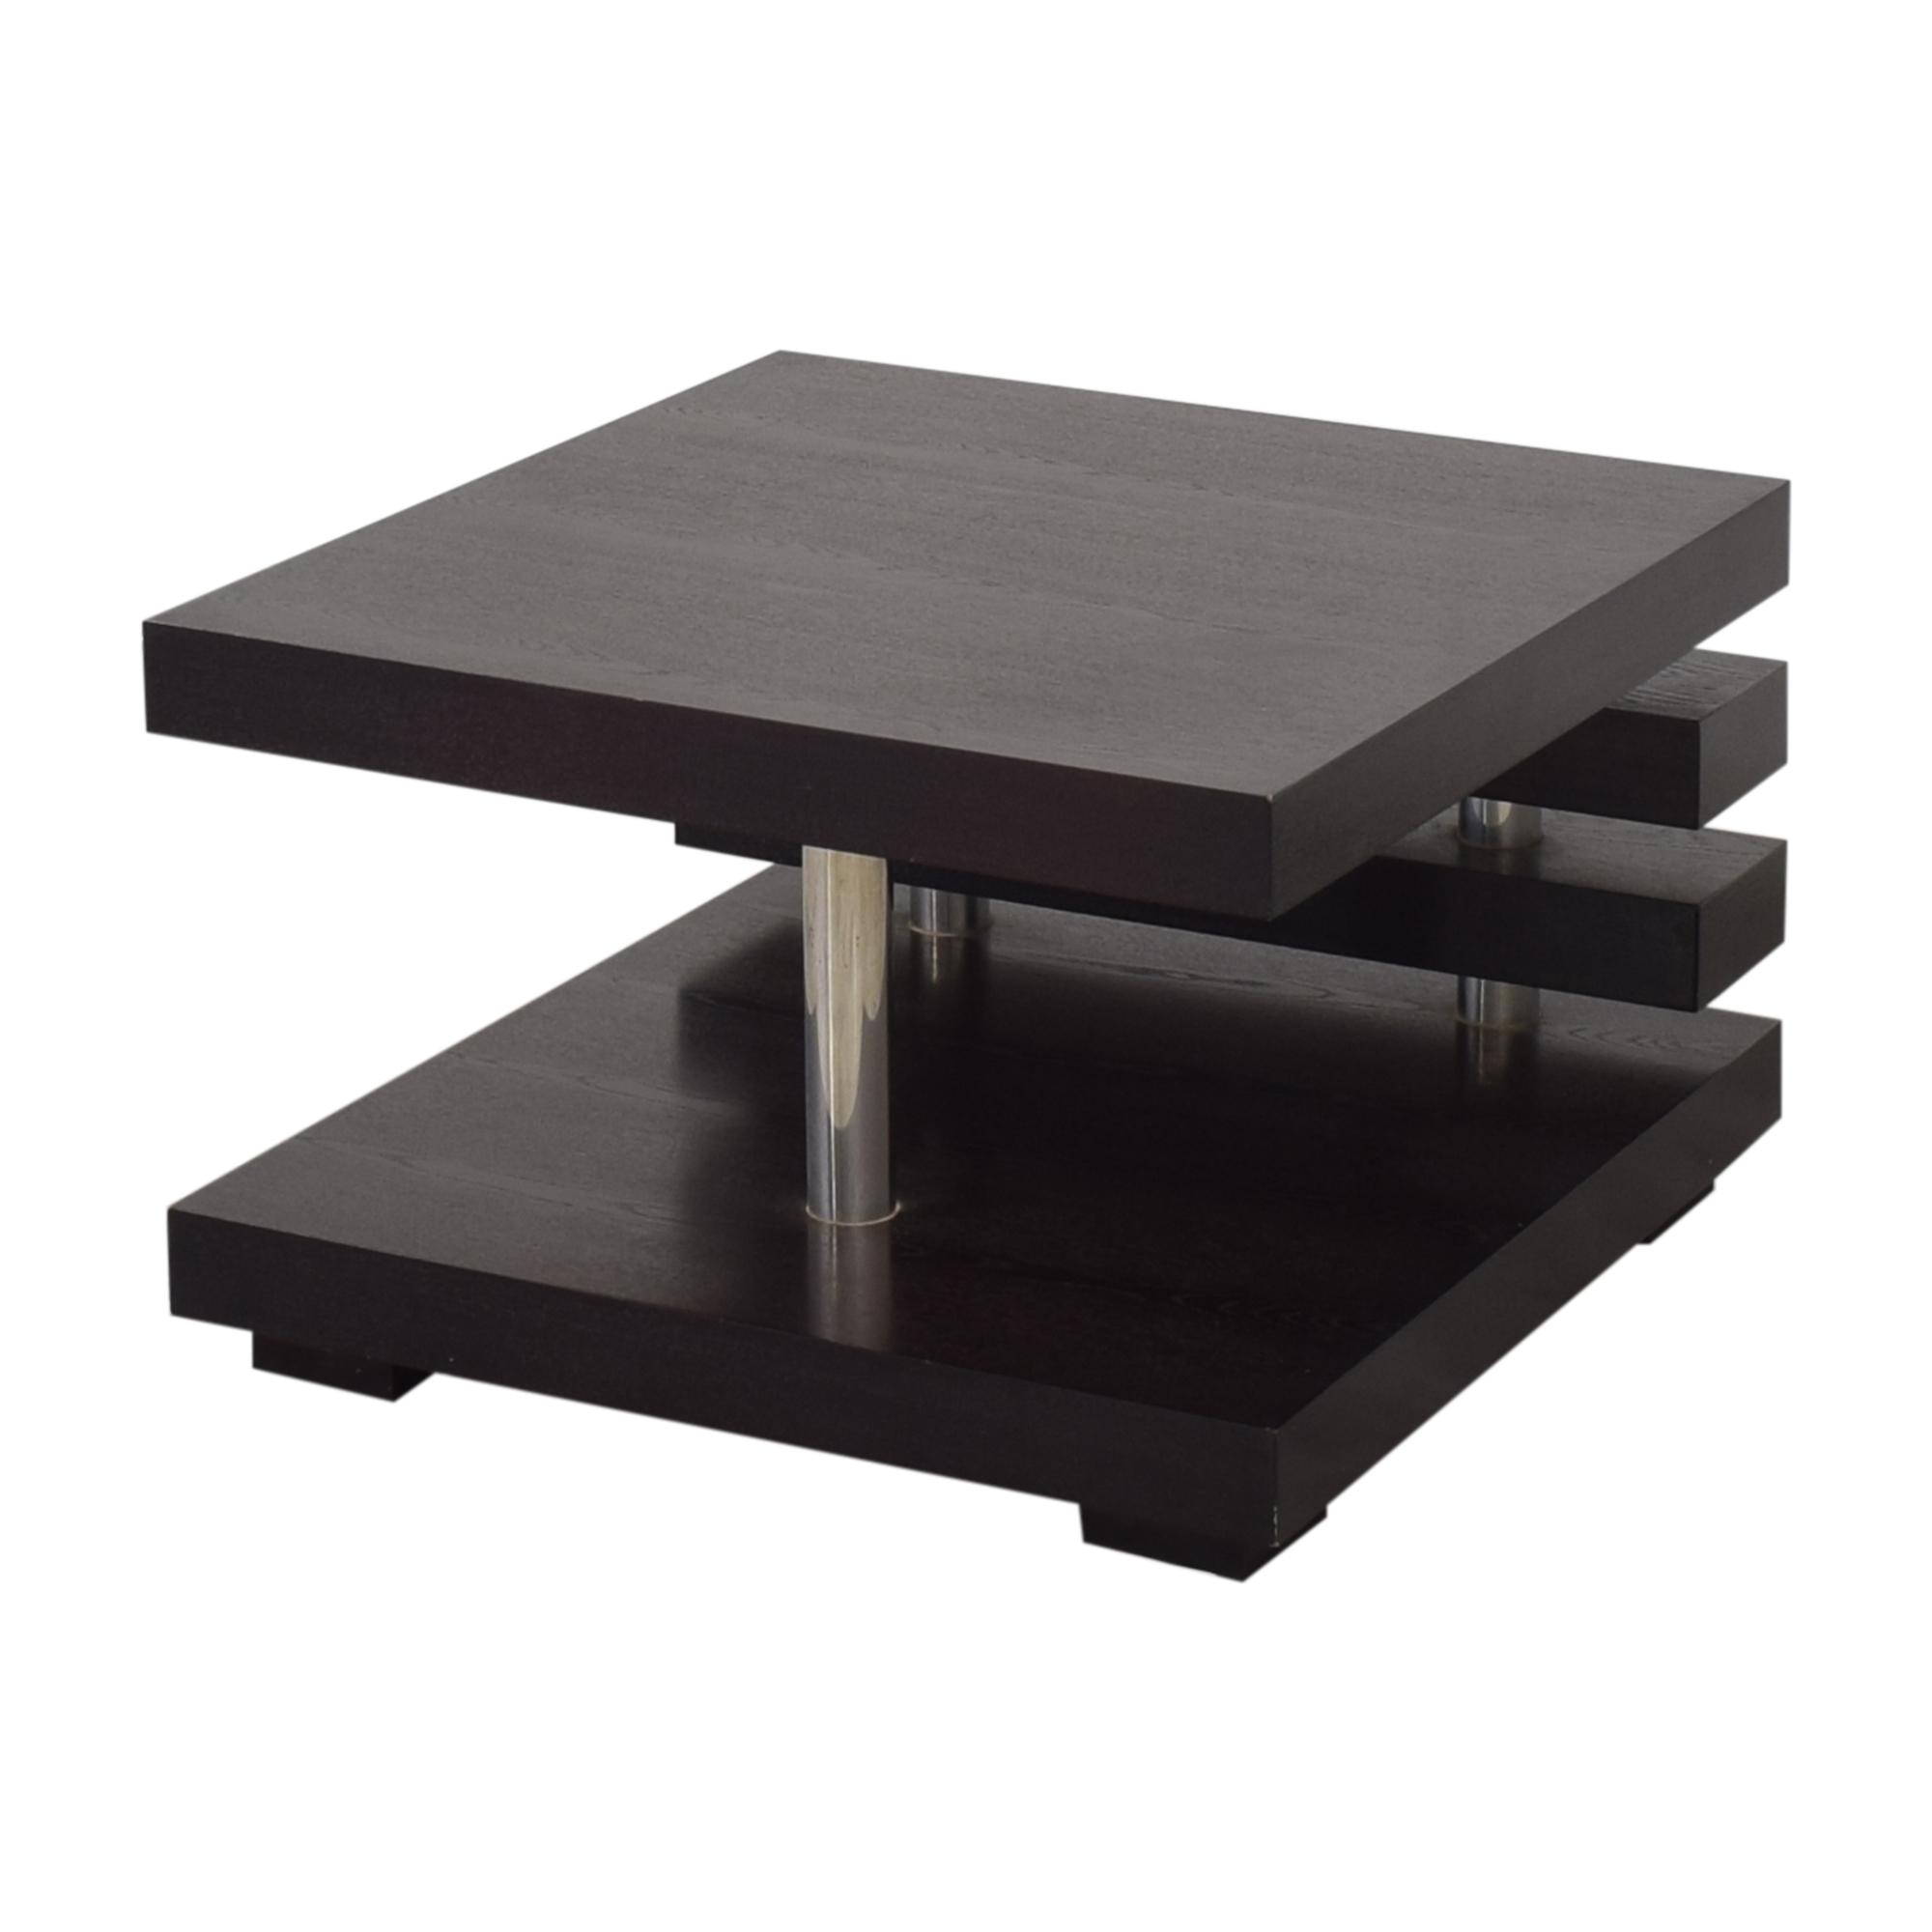 Contemporary Square Coffee Table